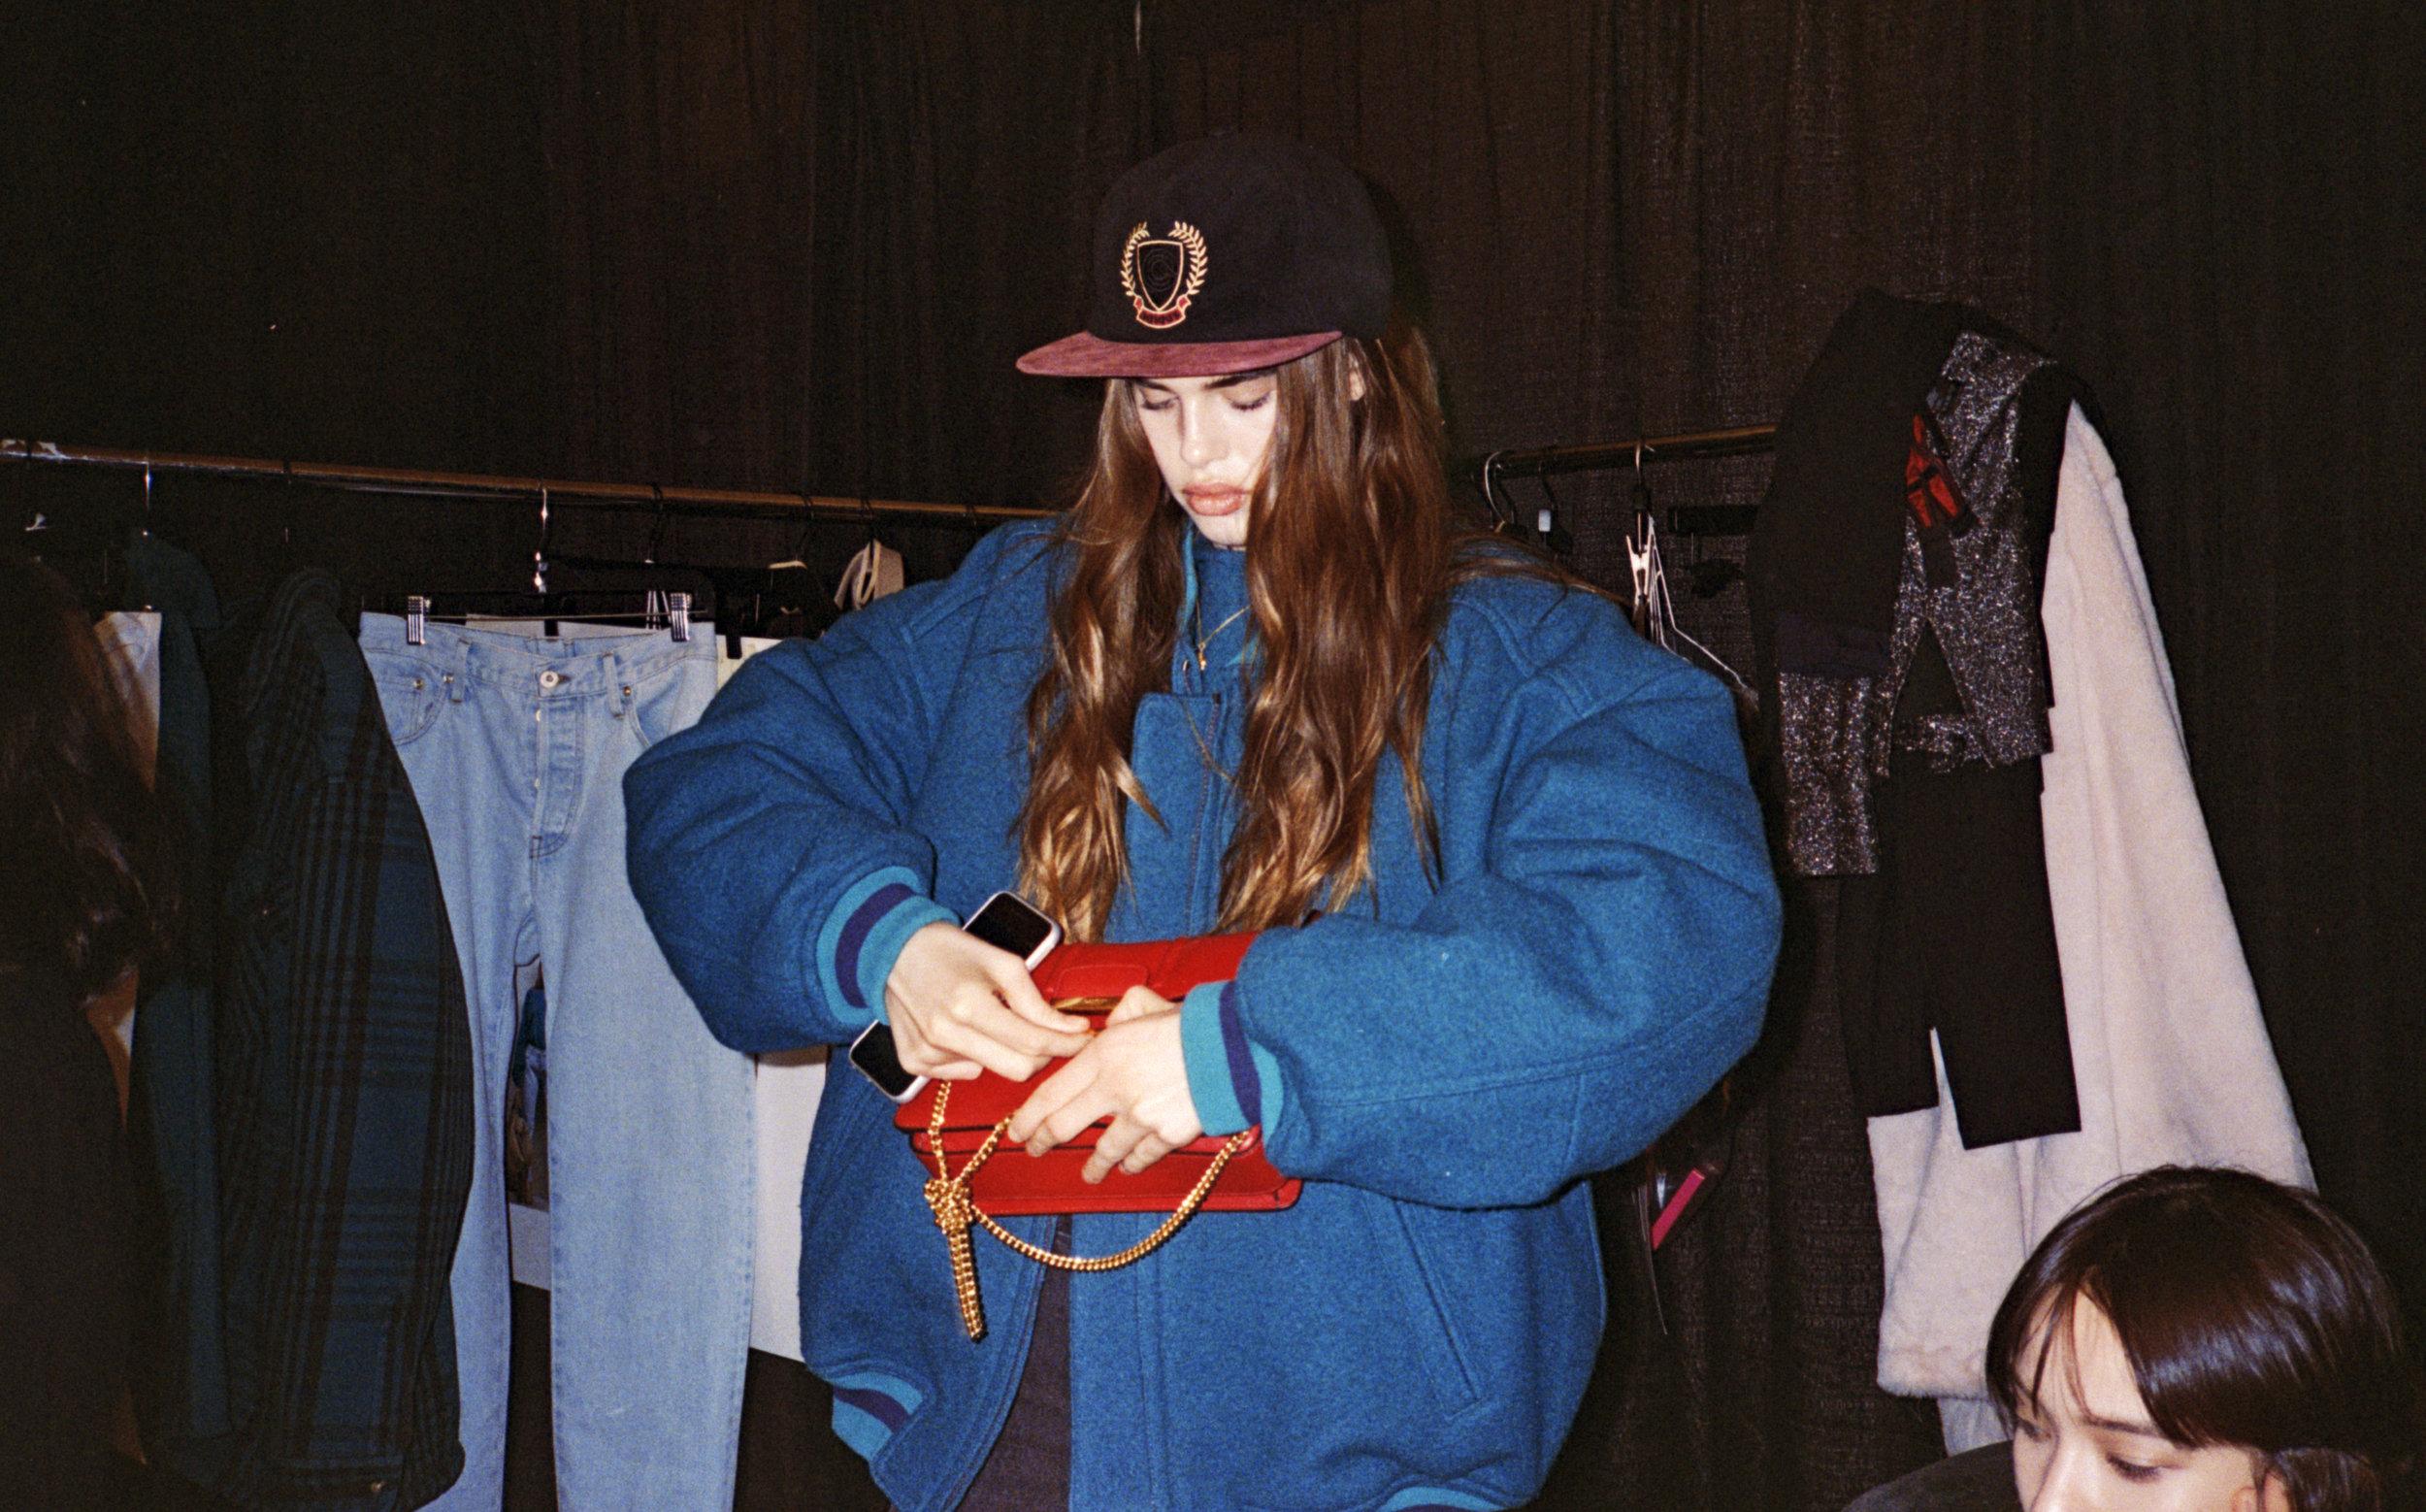 b_feb_NY_2017_yeezy_backstage_55.jpg